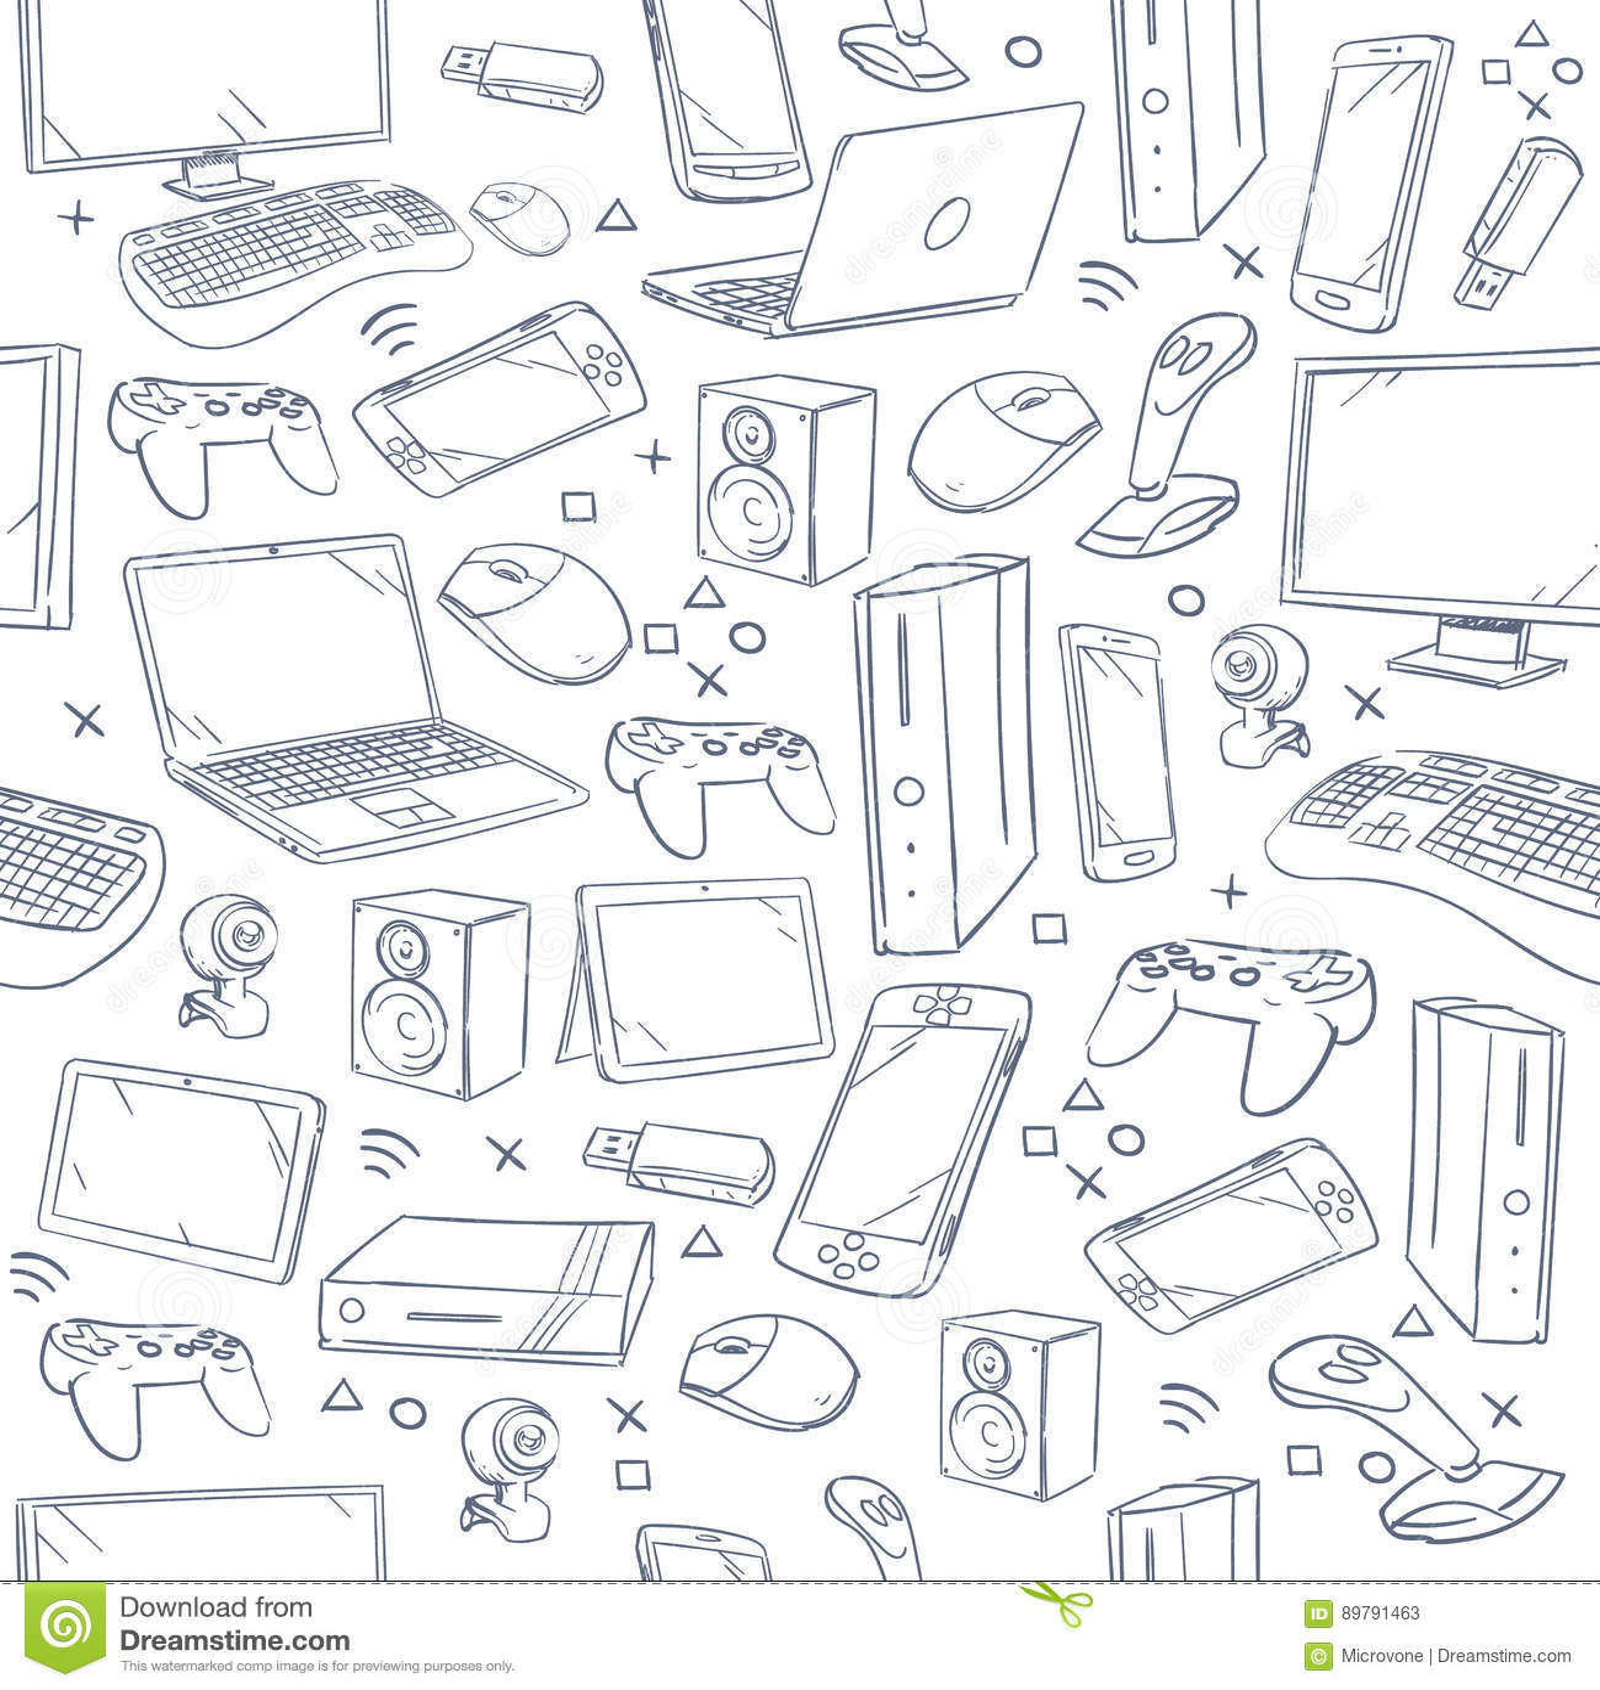 Computer Game Device Social Gaming Vector Sketch Doodles